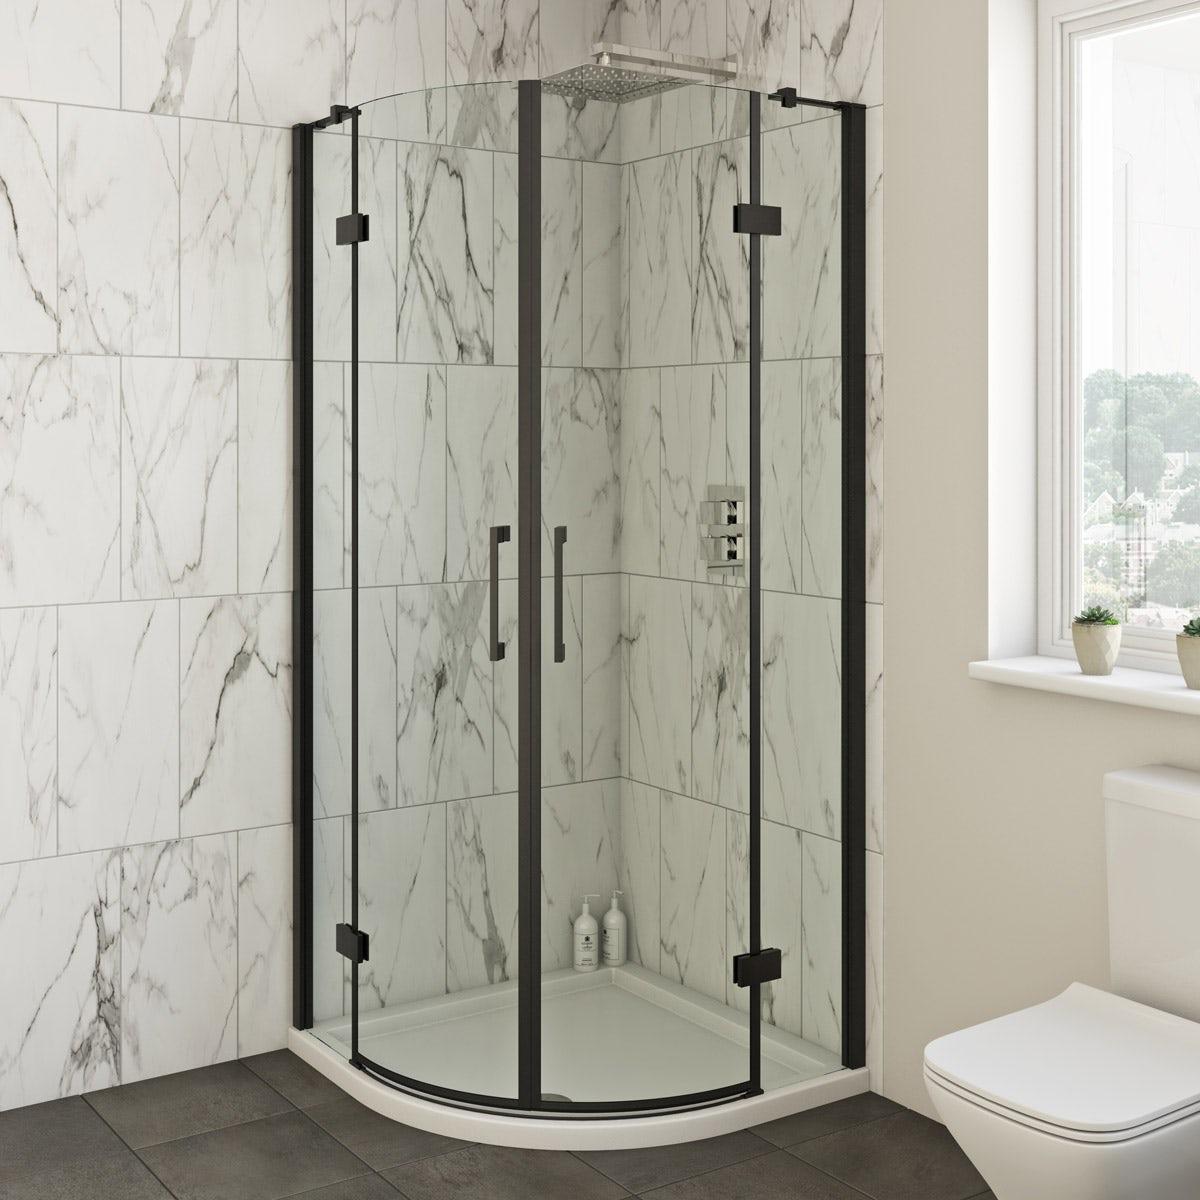 The Mode Cooper Black Hinged Quadrant Shower Enclosure 900x900